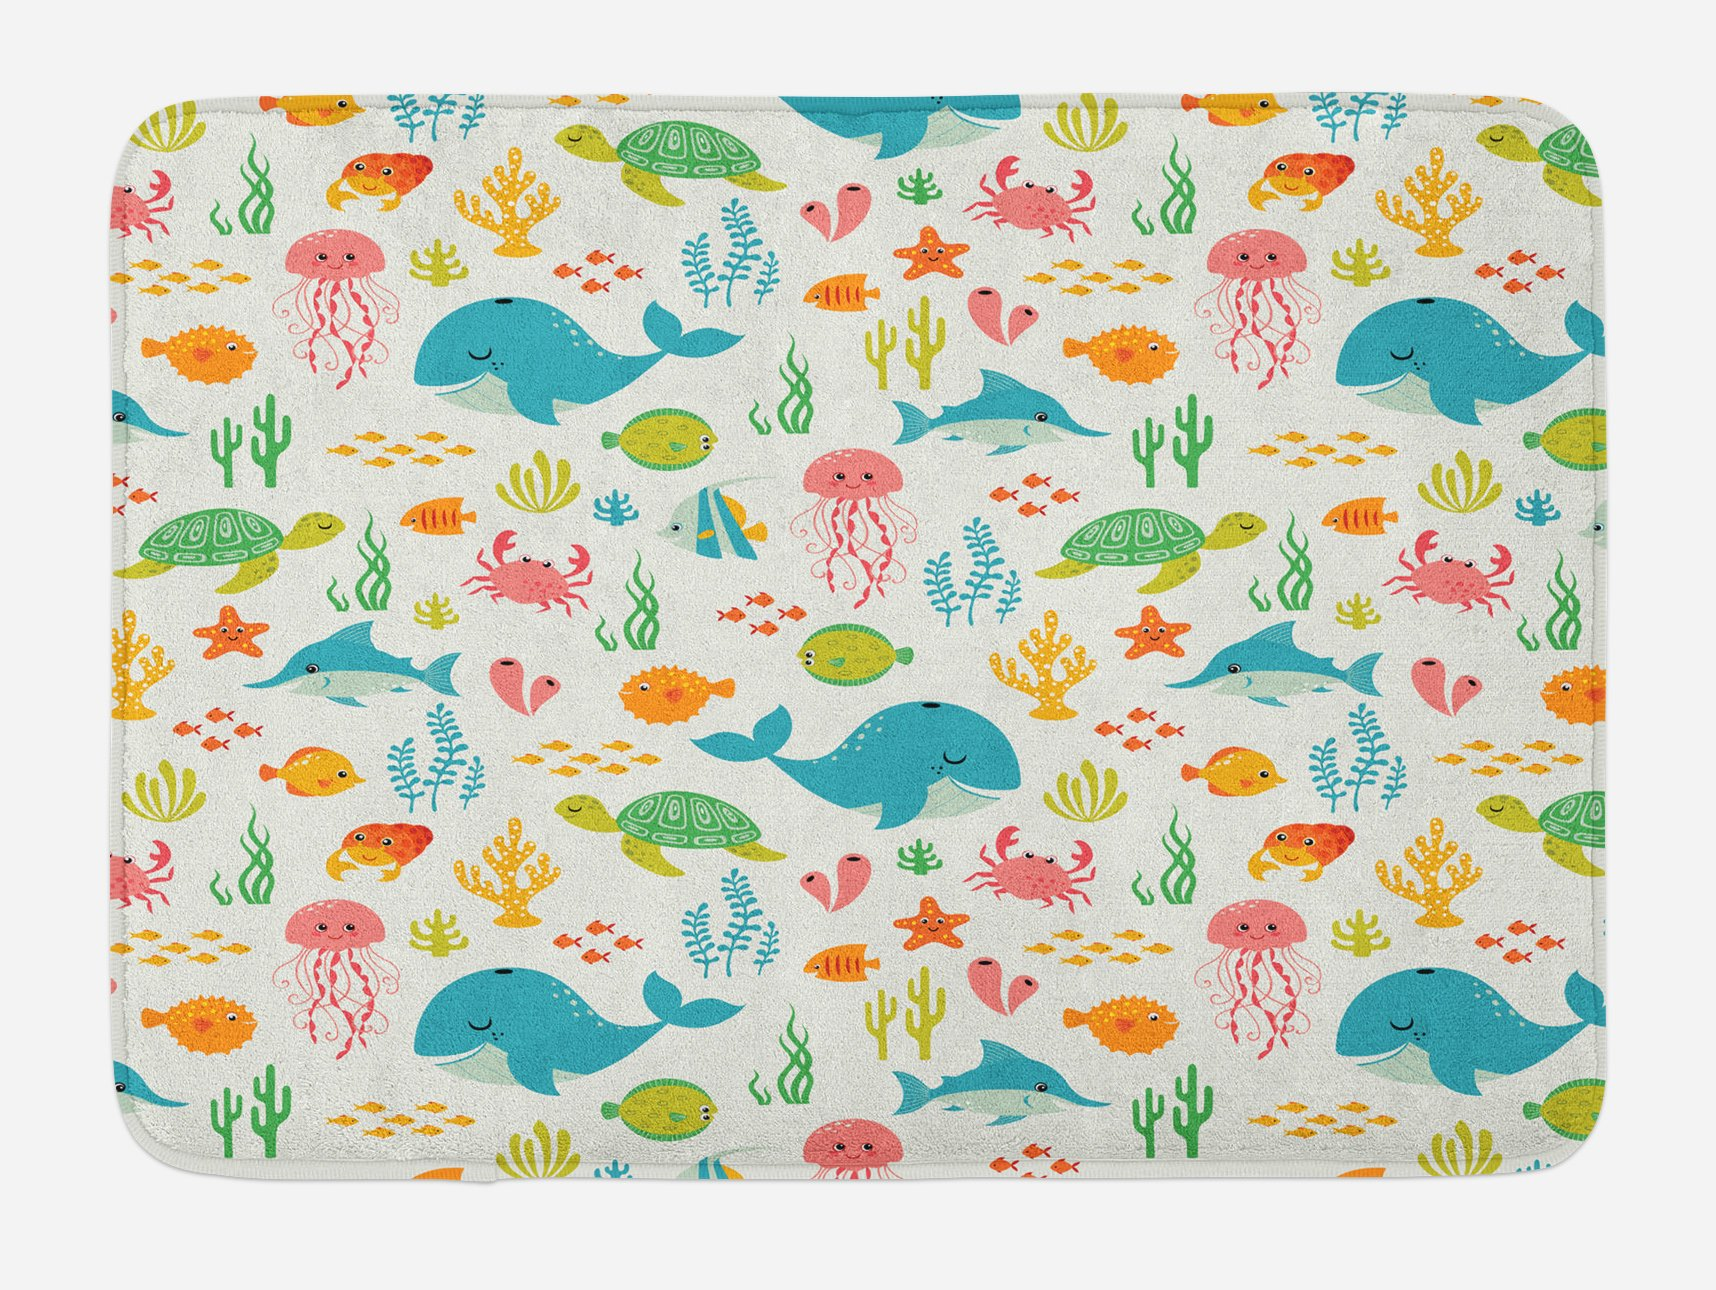 Lunarable Cartoon Bath Mat, Underwater Animals Aqua Marine Life with Crabs Sea Stars Fish Illustration, Plush Bathroom Decor Mat with Non Slip Backing, 29.5 W X 17.5 W Inches, Teal Green Yellow